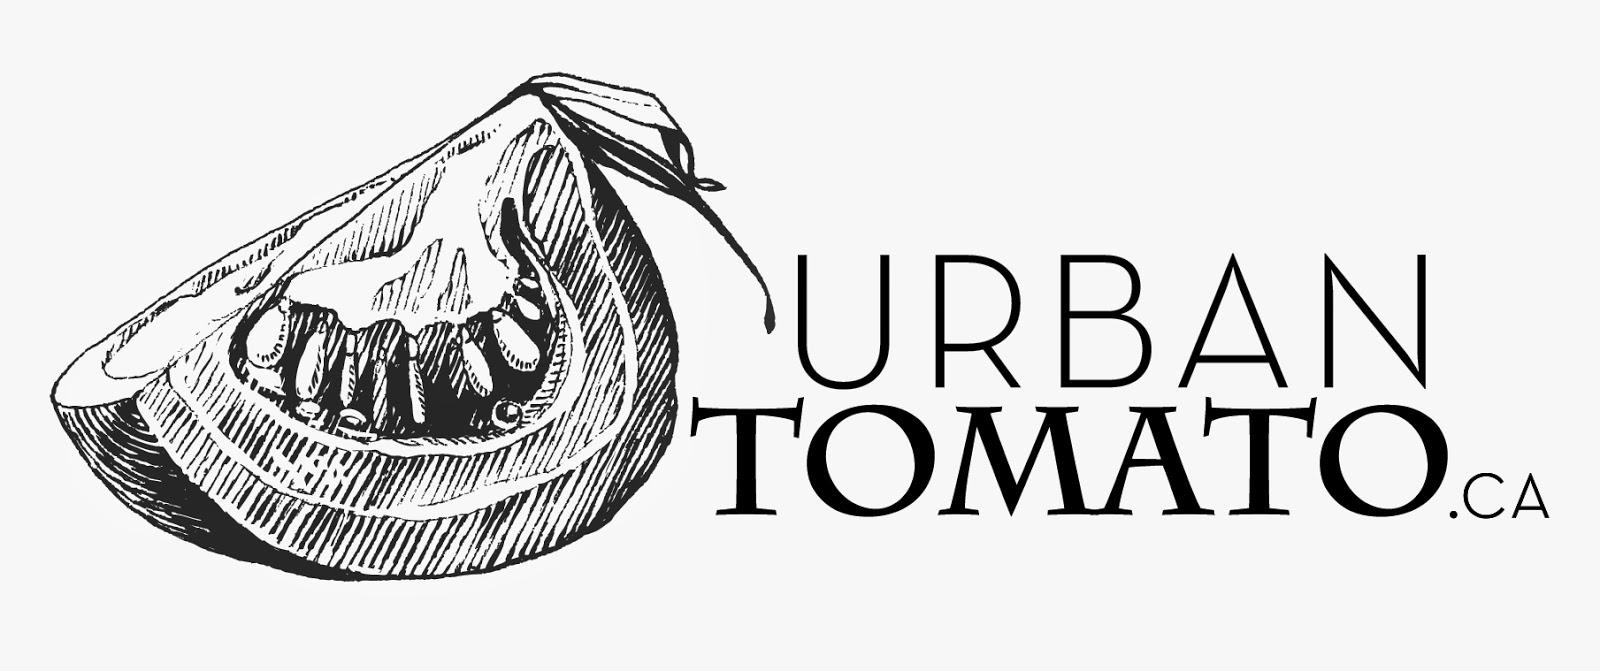 http://urbantomato.ca